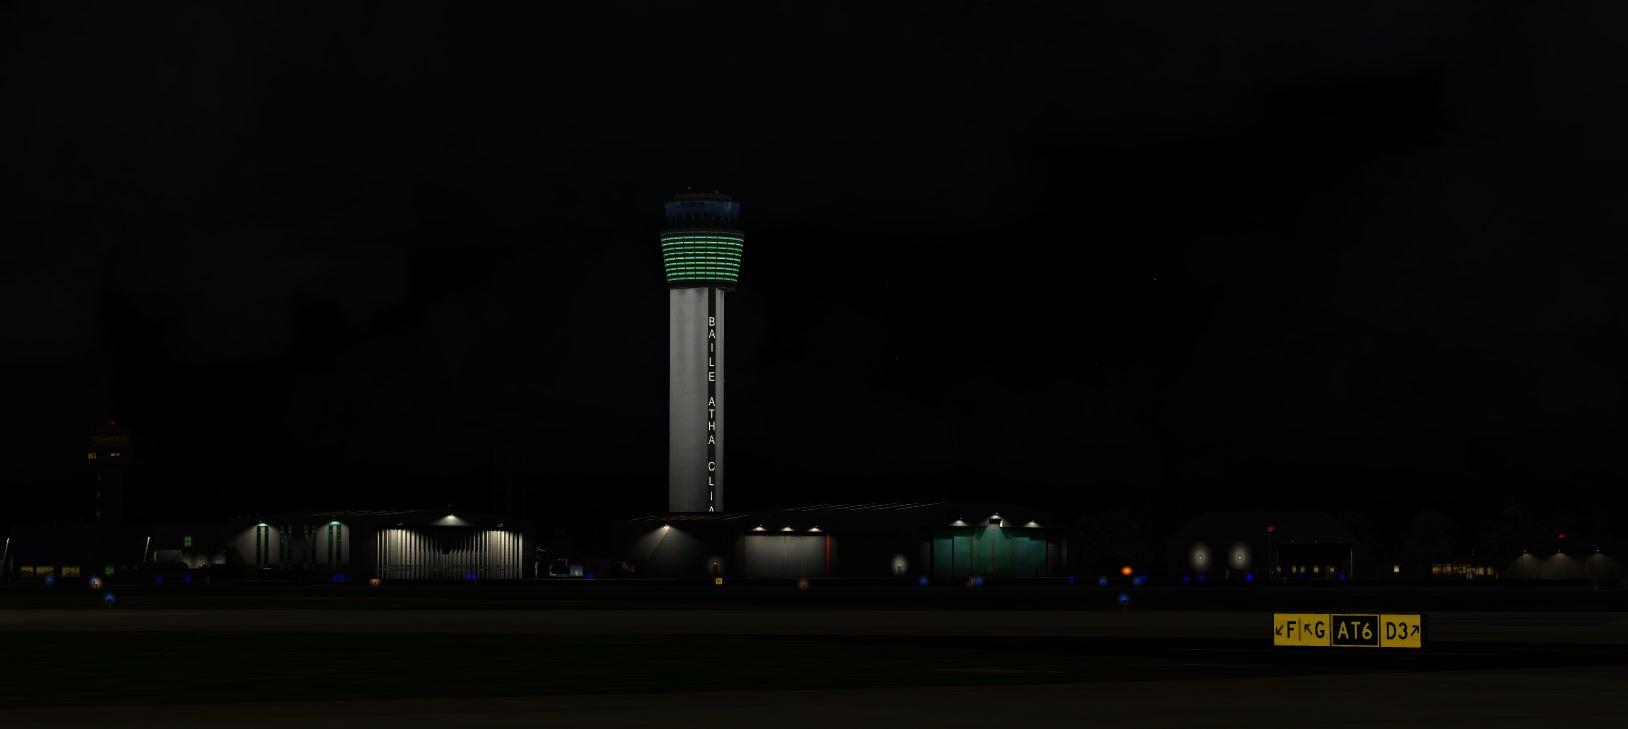 2021-07-16 23_22_23-Microsoft Flight Simulator 2004 - A Century of Flight.jpg